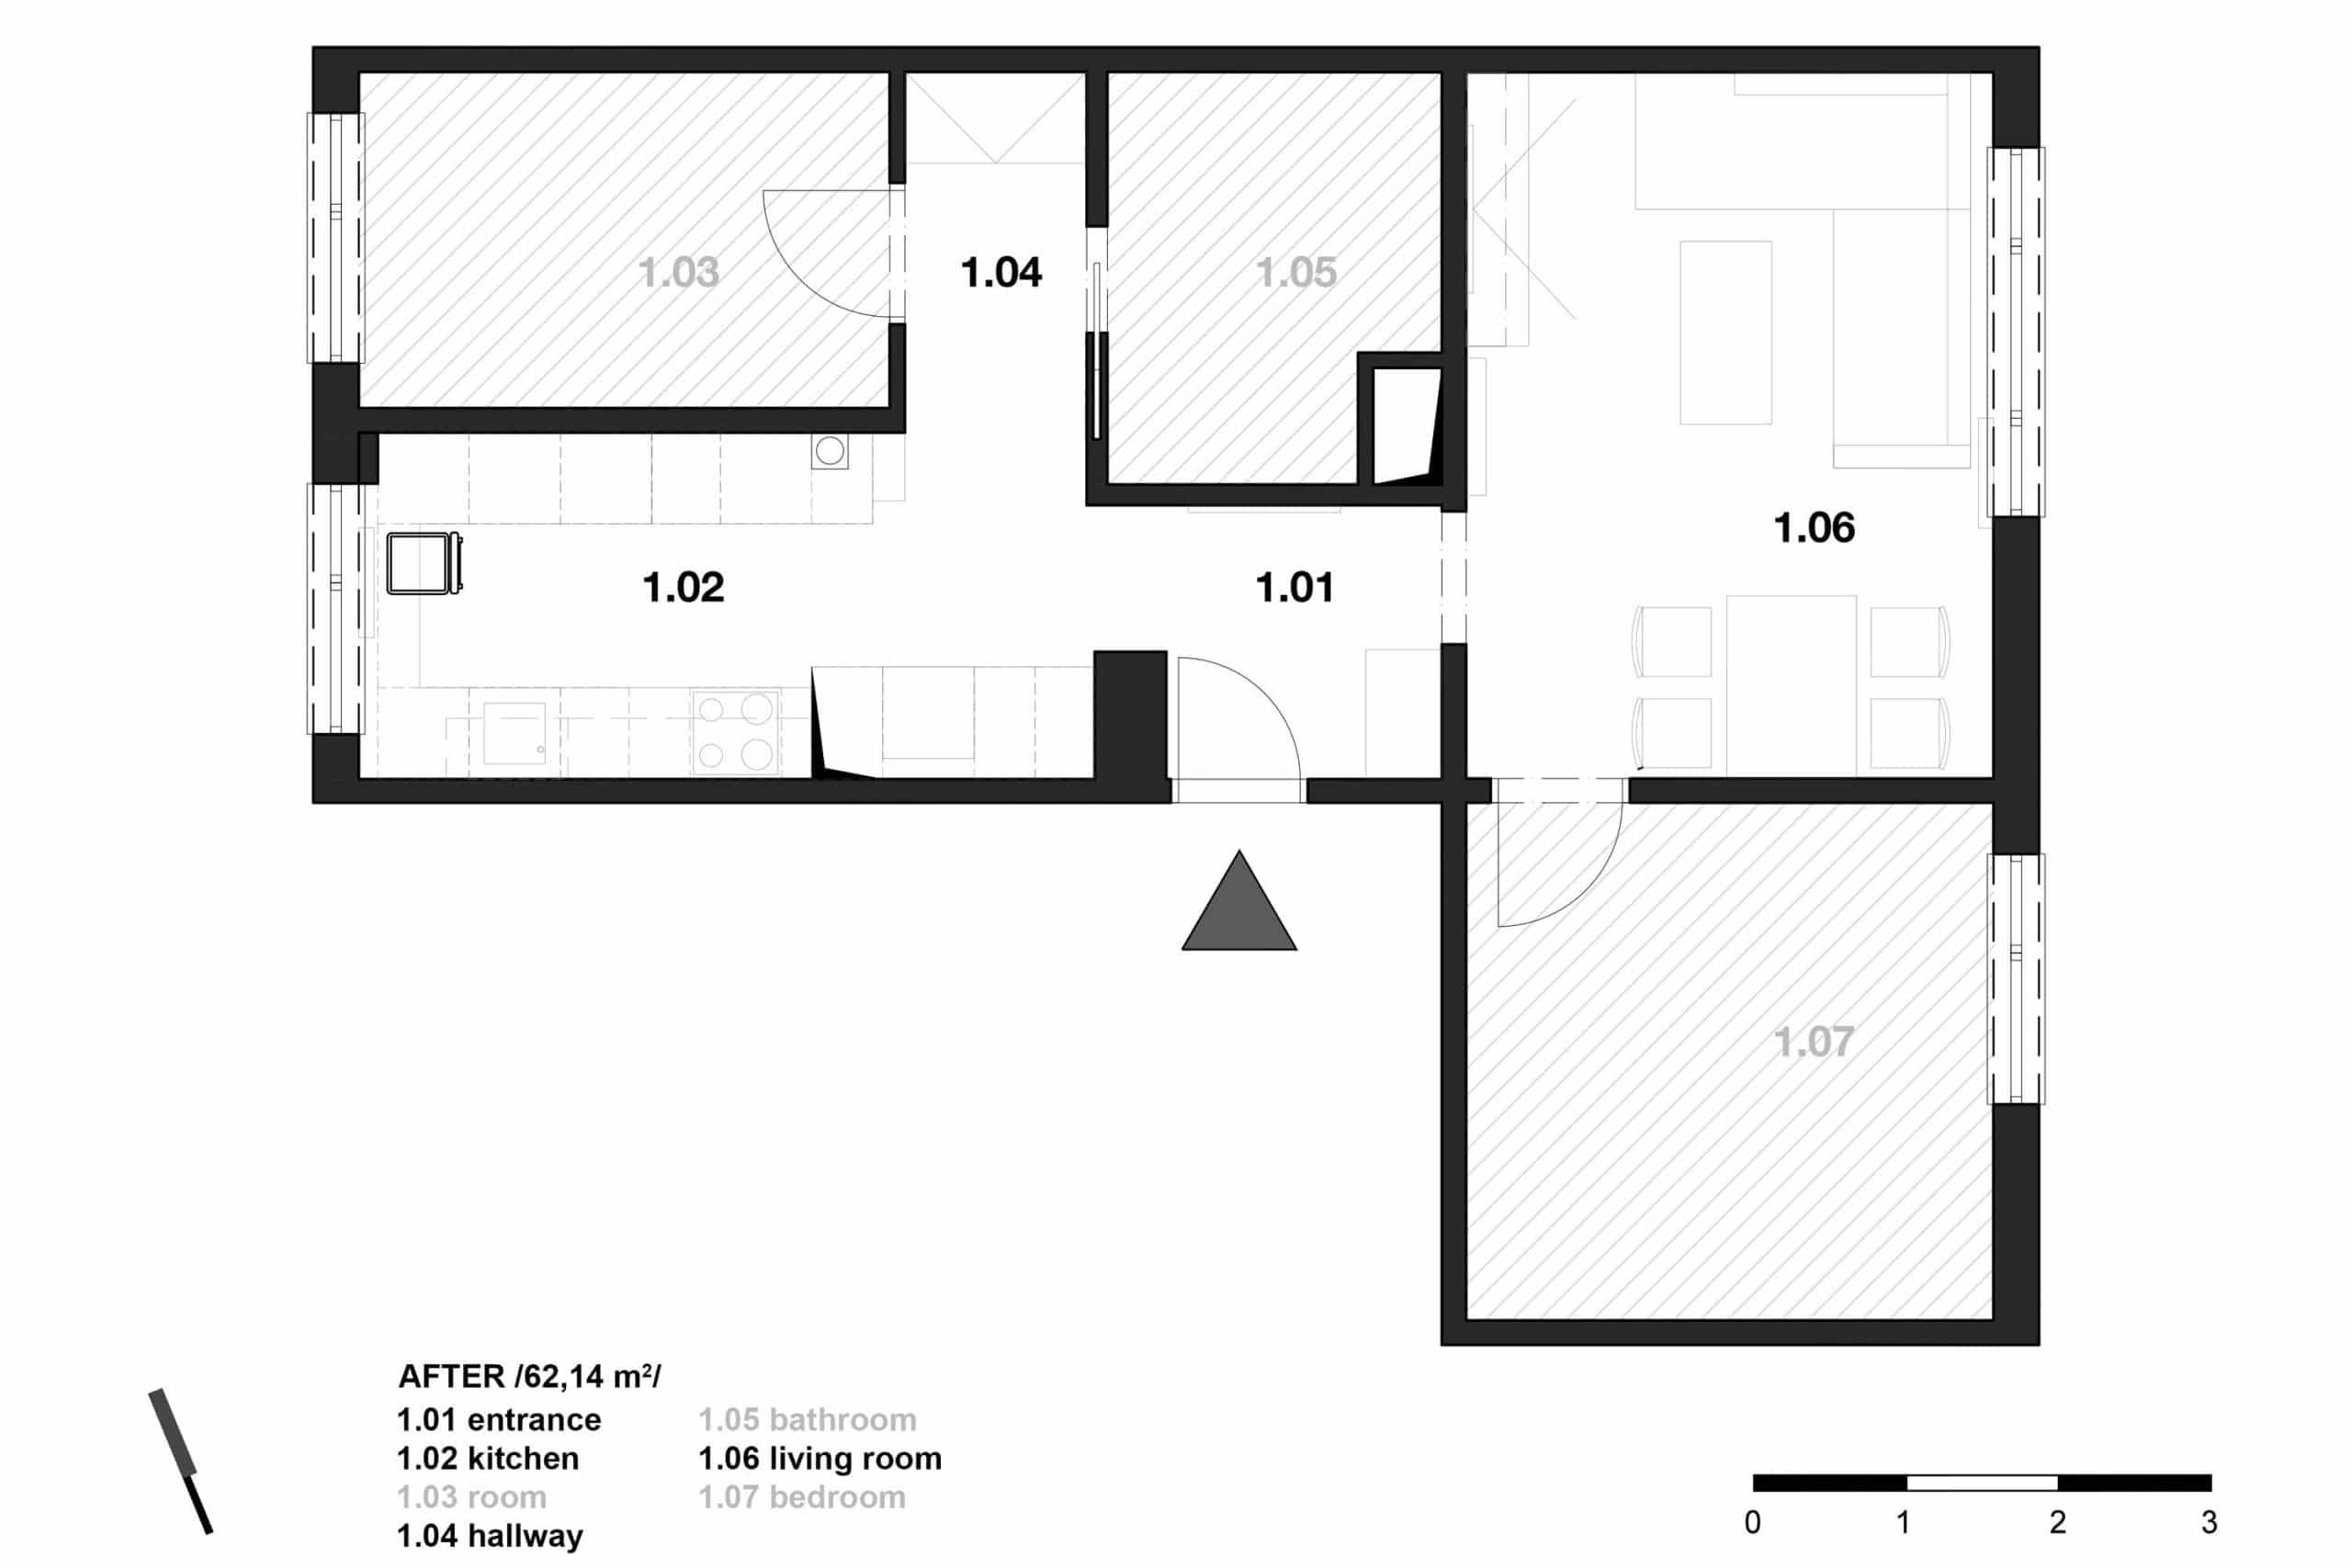 Dise o departamento peque o 62 m planos construye hogar - Fotos de casas en forma de l ...